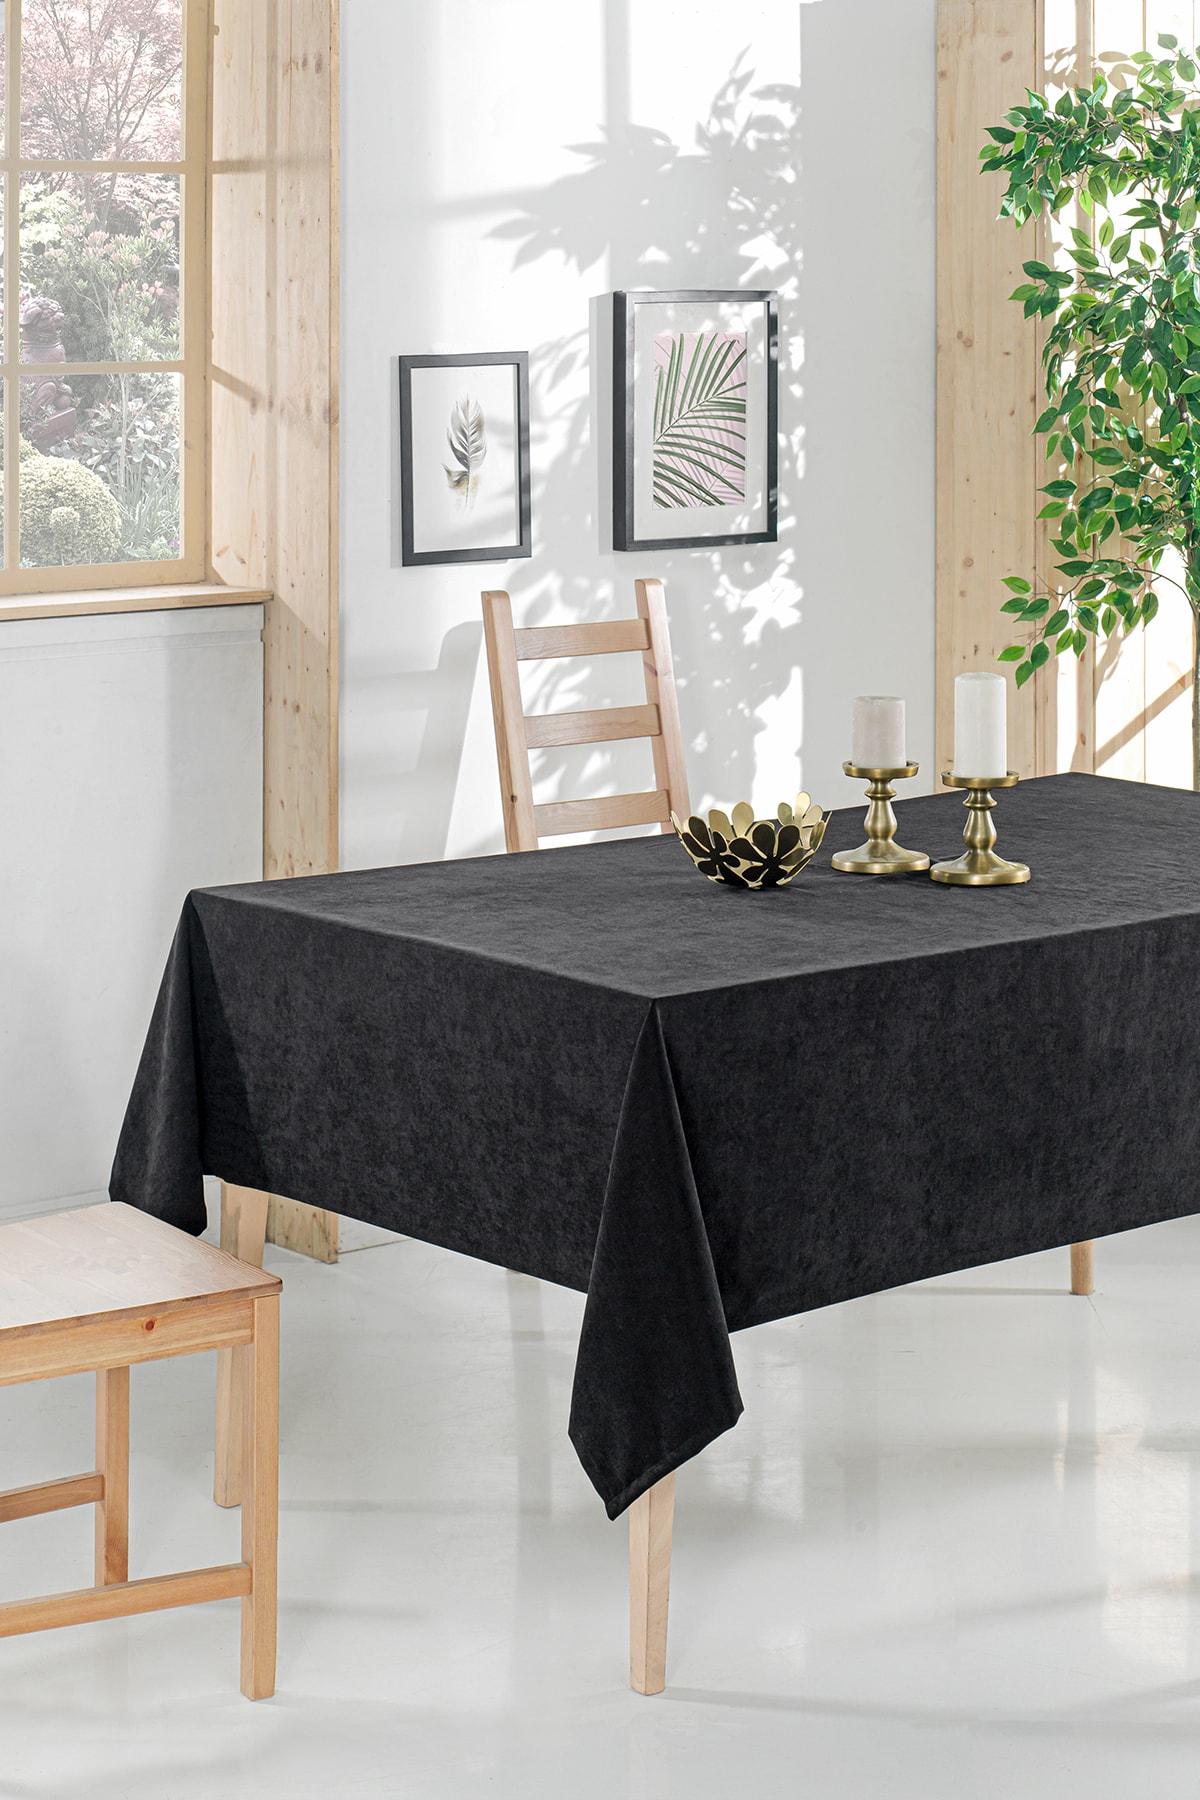 Siyah Sade Kadifemsi Mutfak Salon Masa Örtüsü  Masa-194  160x220 cm